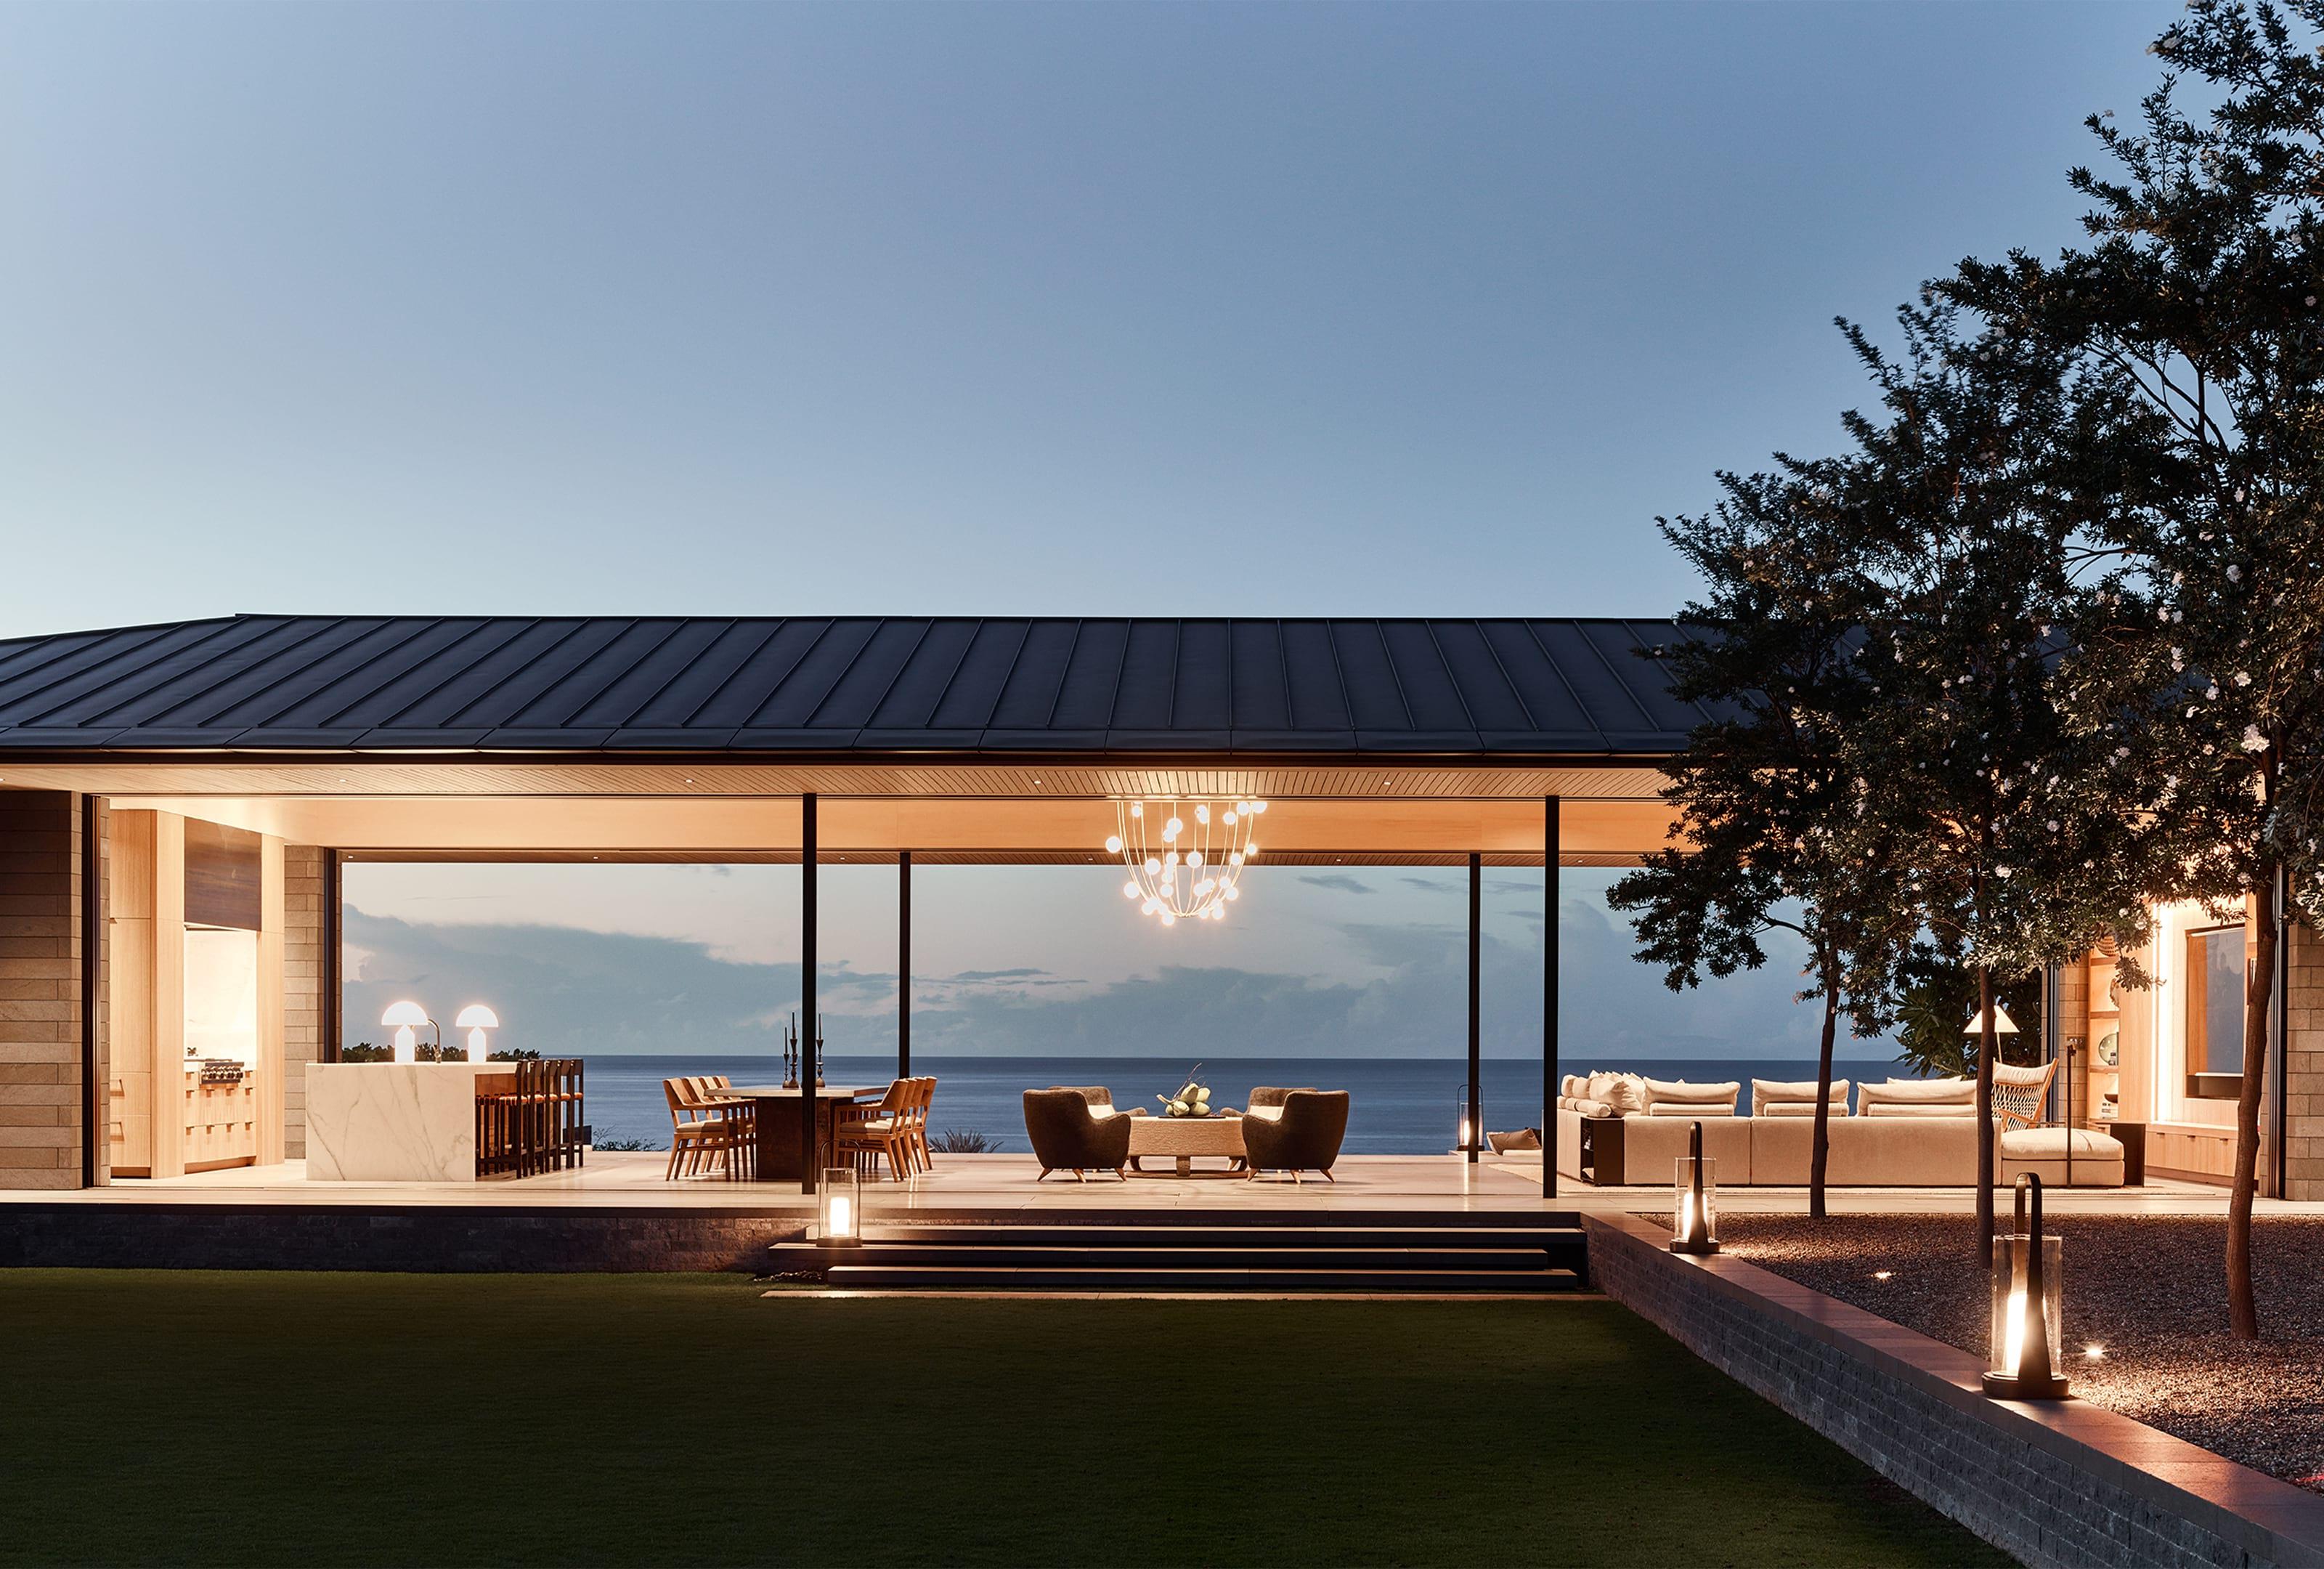 nicolehollis NICOLEHOLLIS: A Source Of Design Inspiration 2 568 Hollis Durban Kona HouseExt2 784 02 02